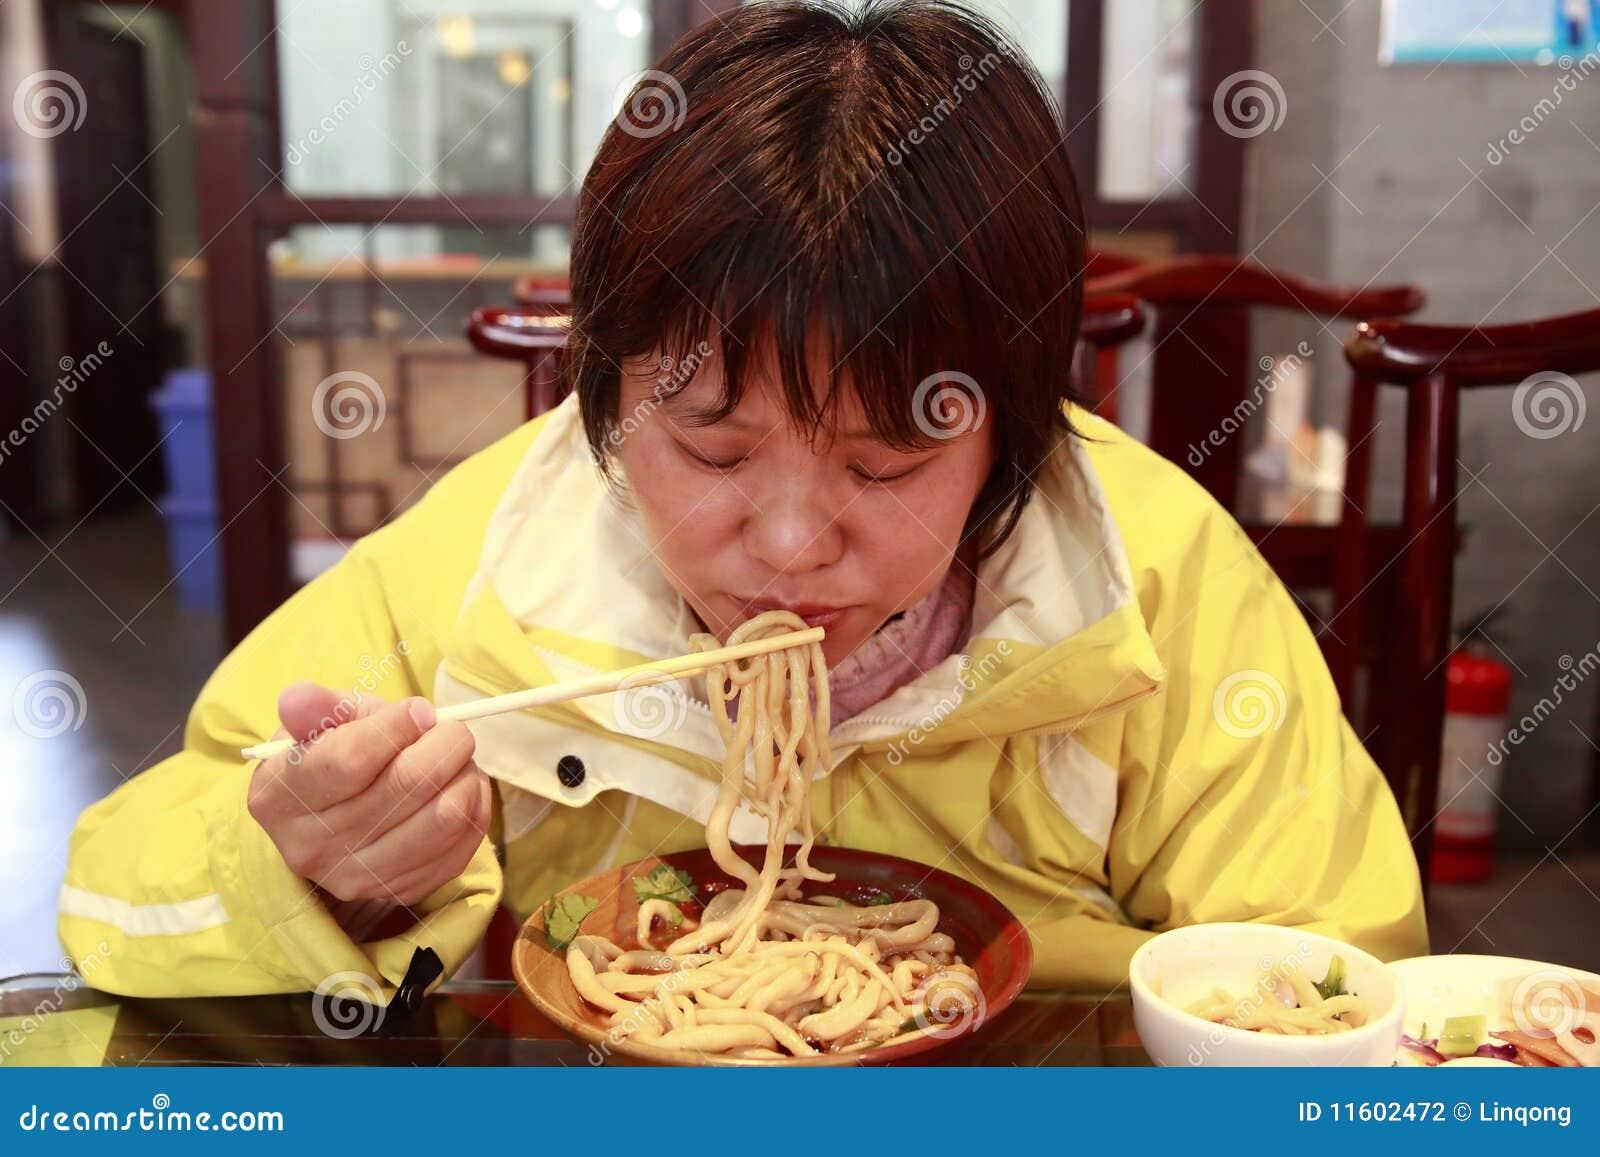 Chinese Female Eating Noodles Stock Photography Image